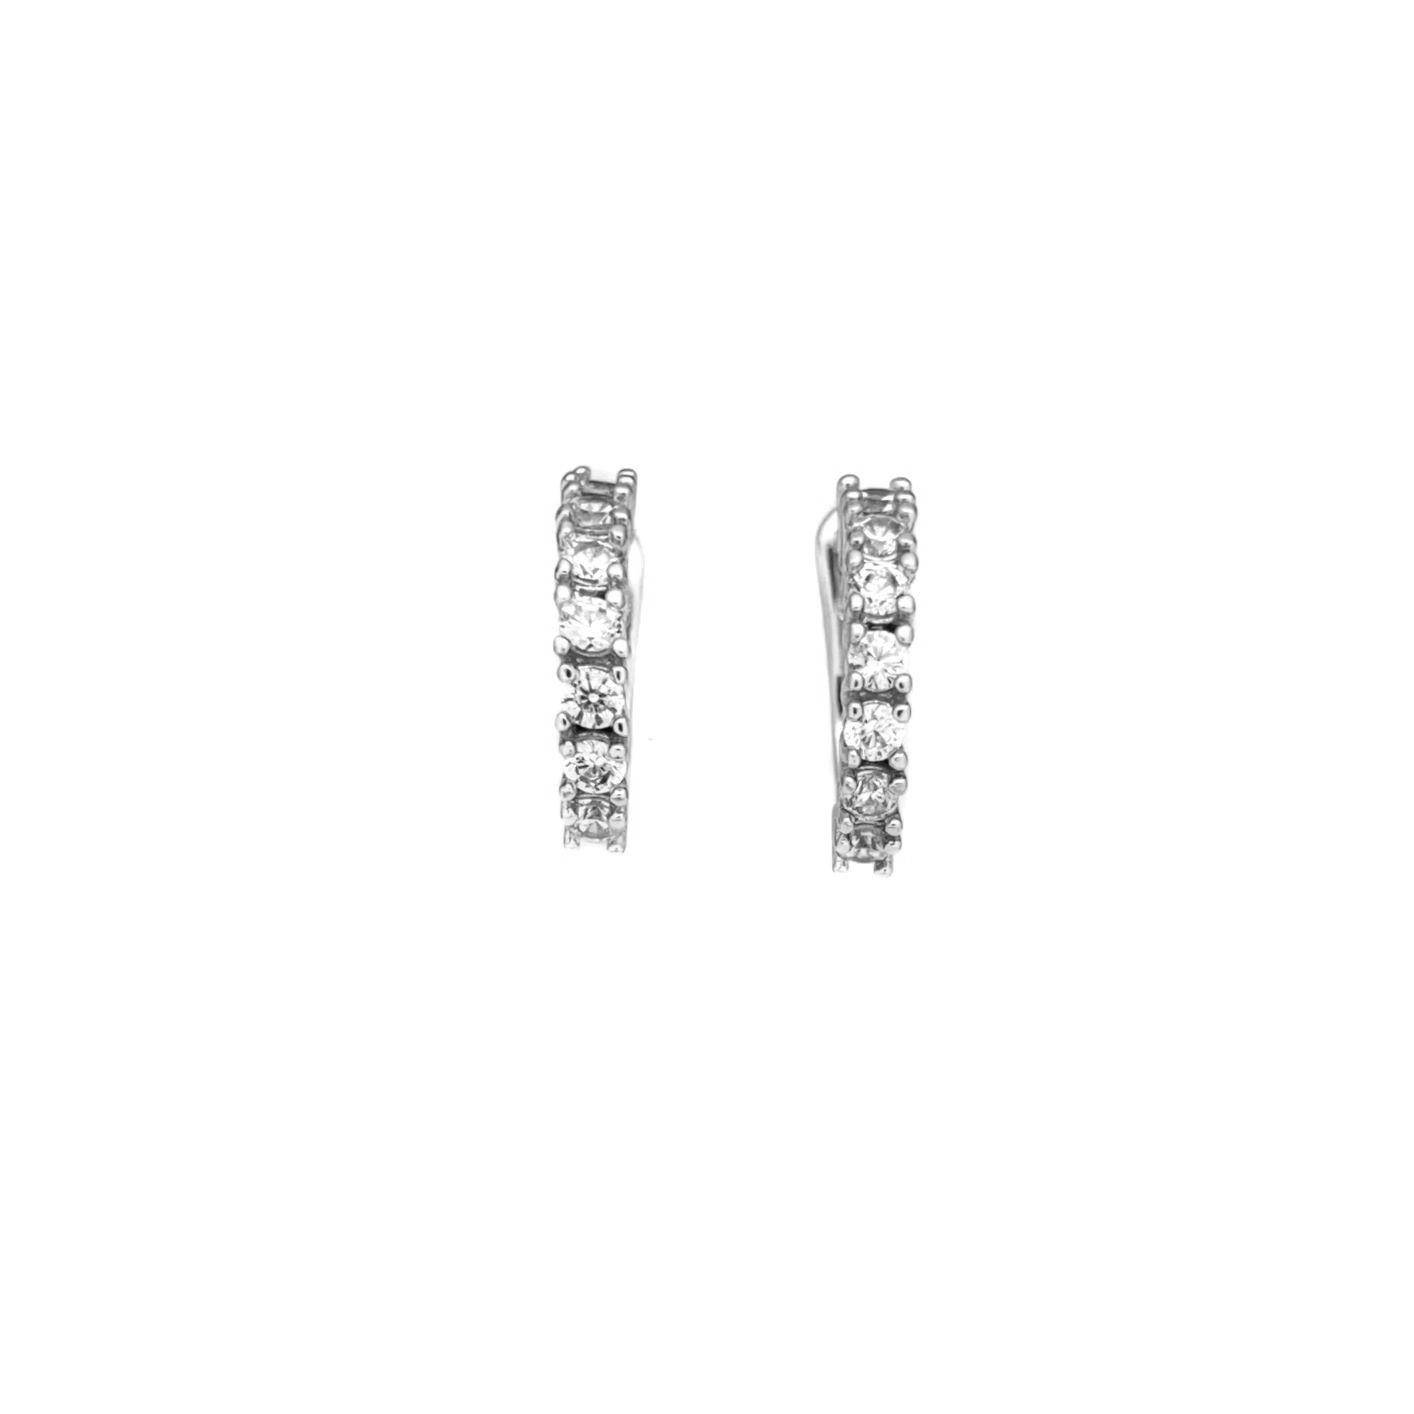 Piercing Fake Concha Helix Zircônia 1 Fileira (Banho Prata 925)